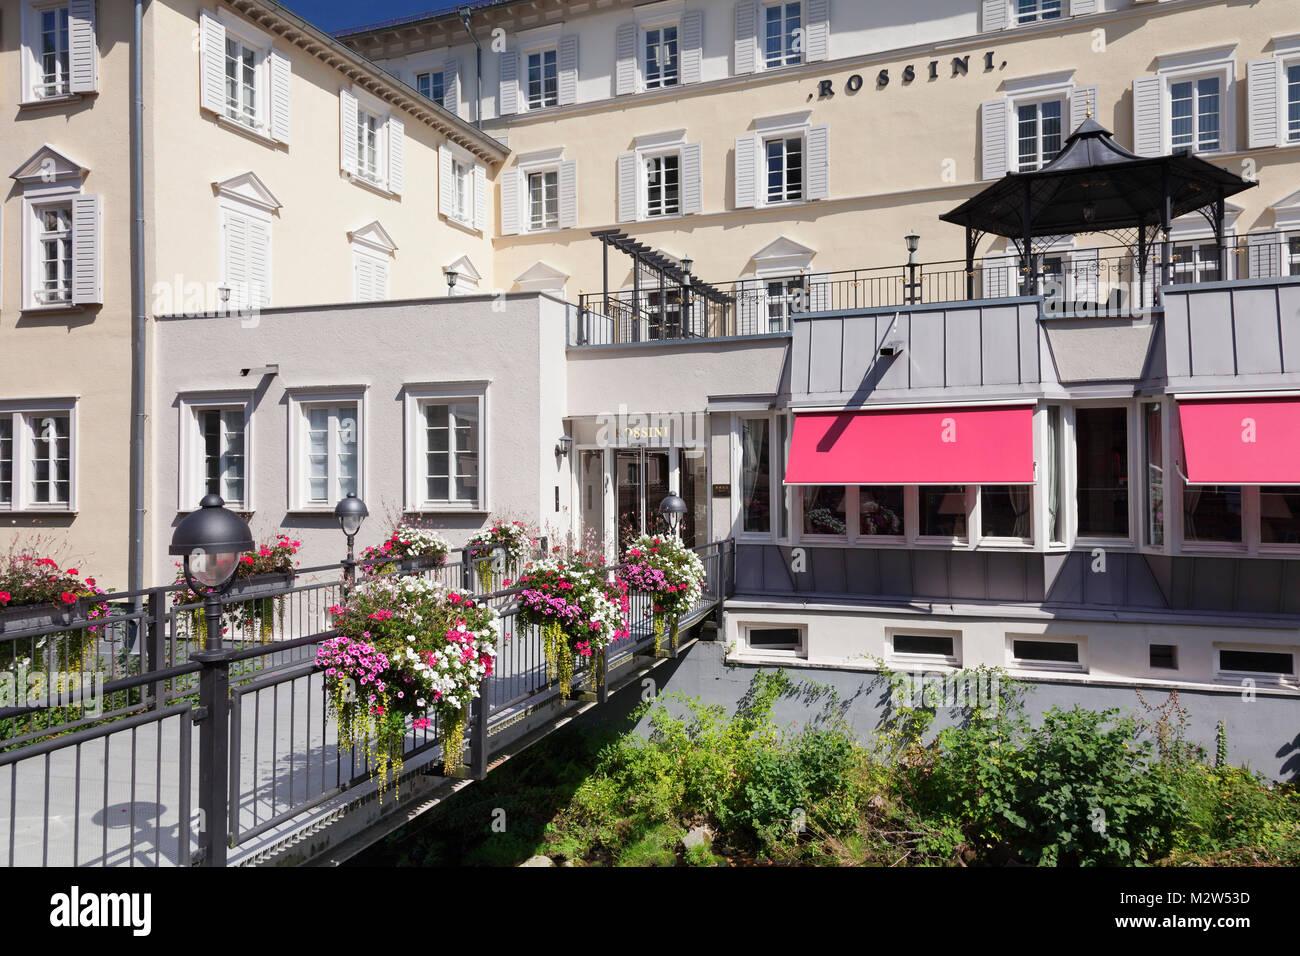 Bad Wildbad Rossini Hotel